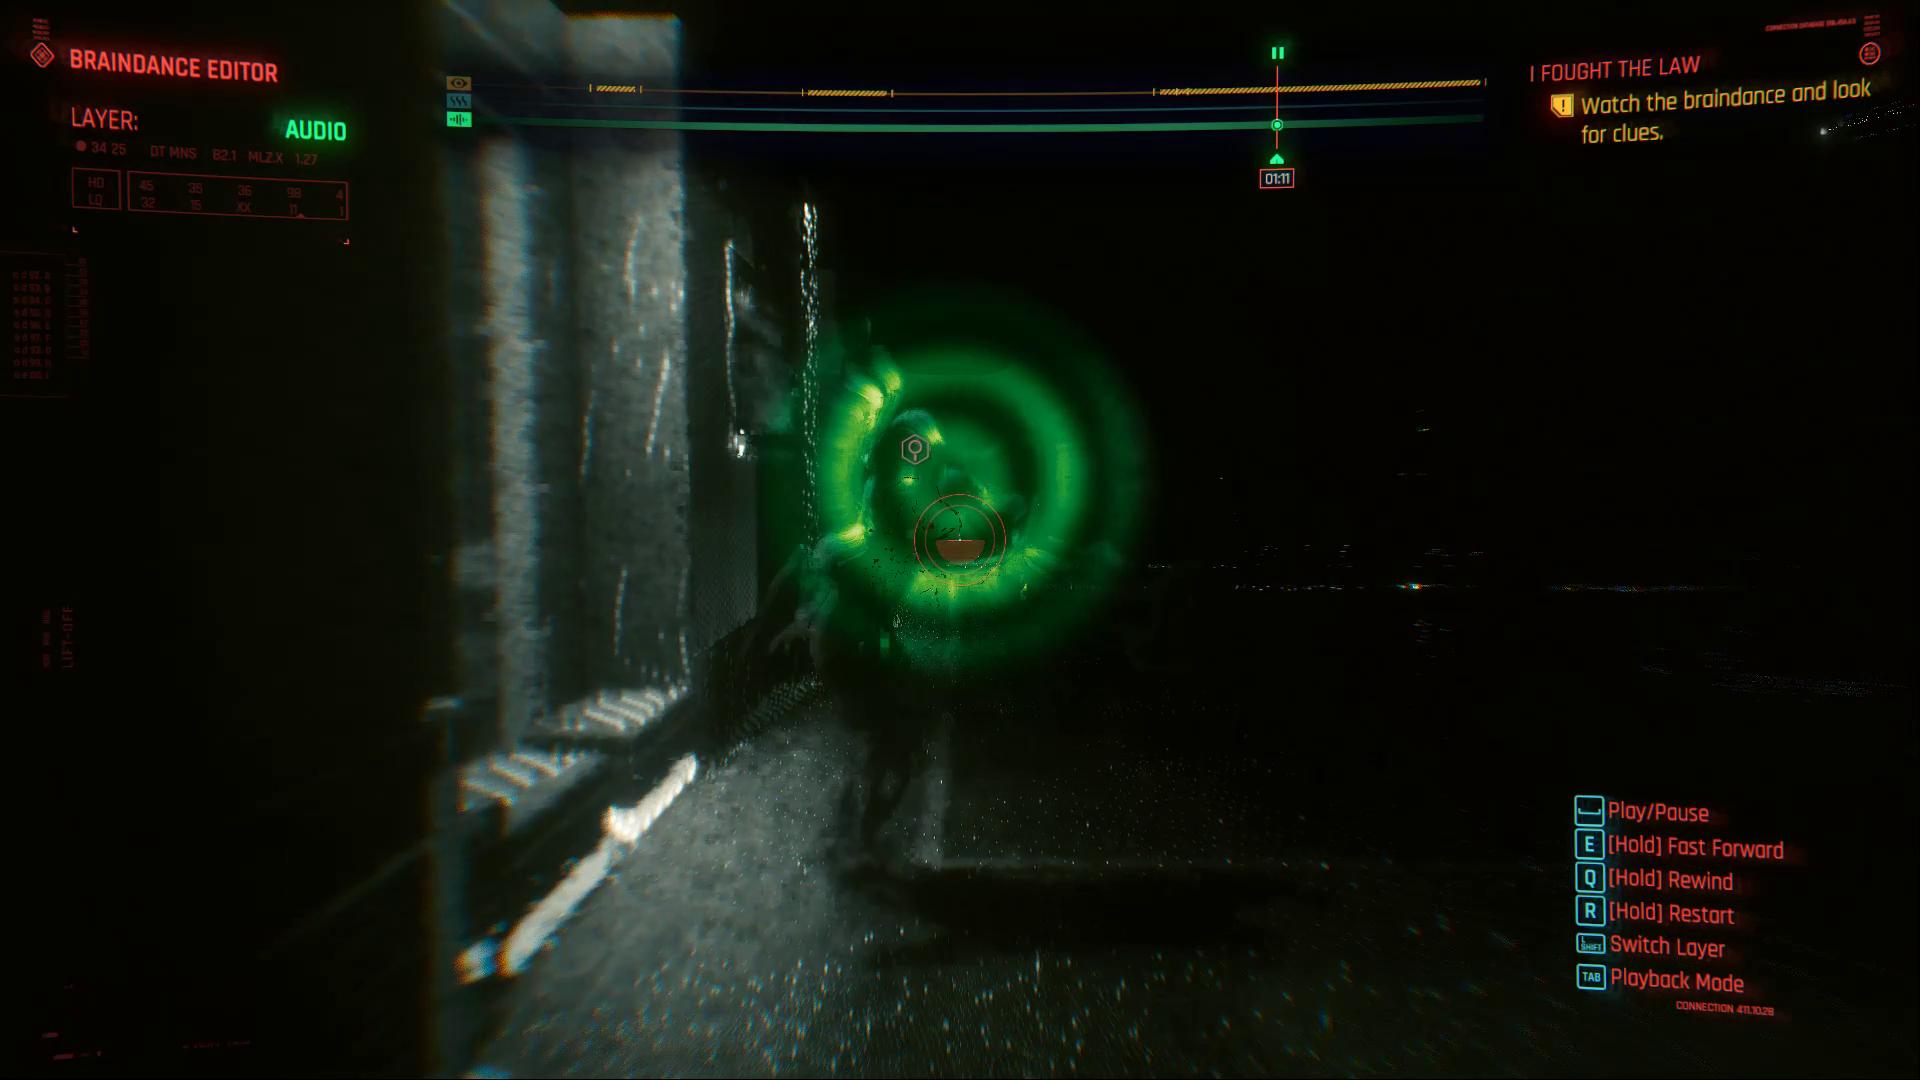 Cyberpunk 2077 Braindance Horvath Humming